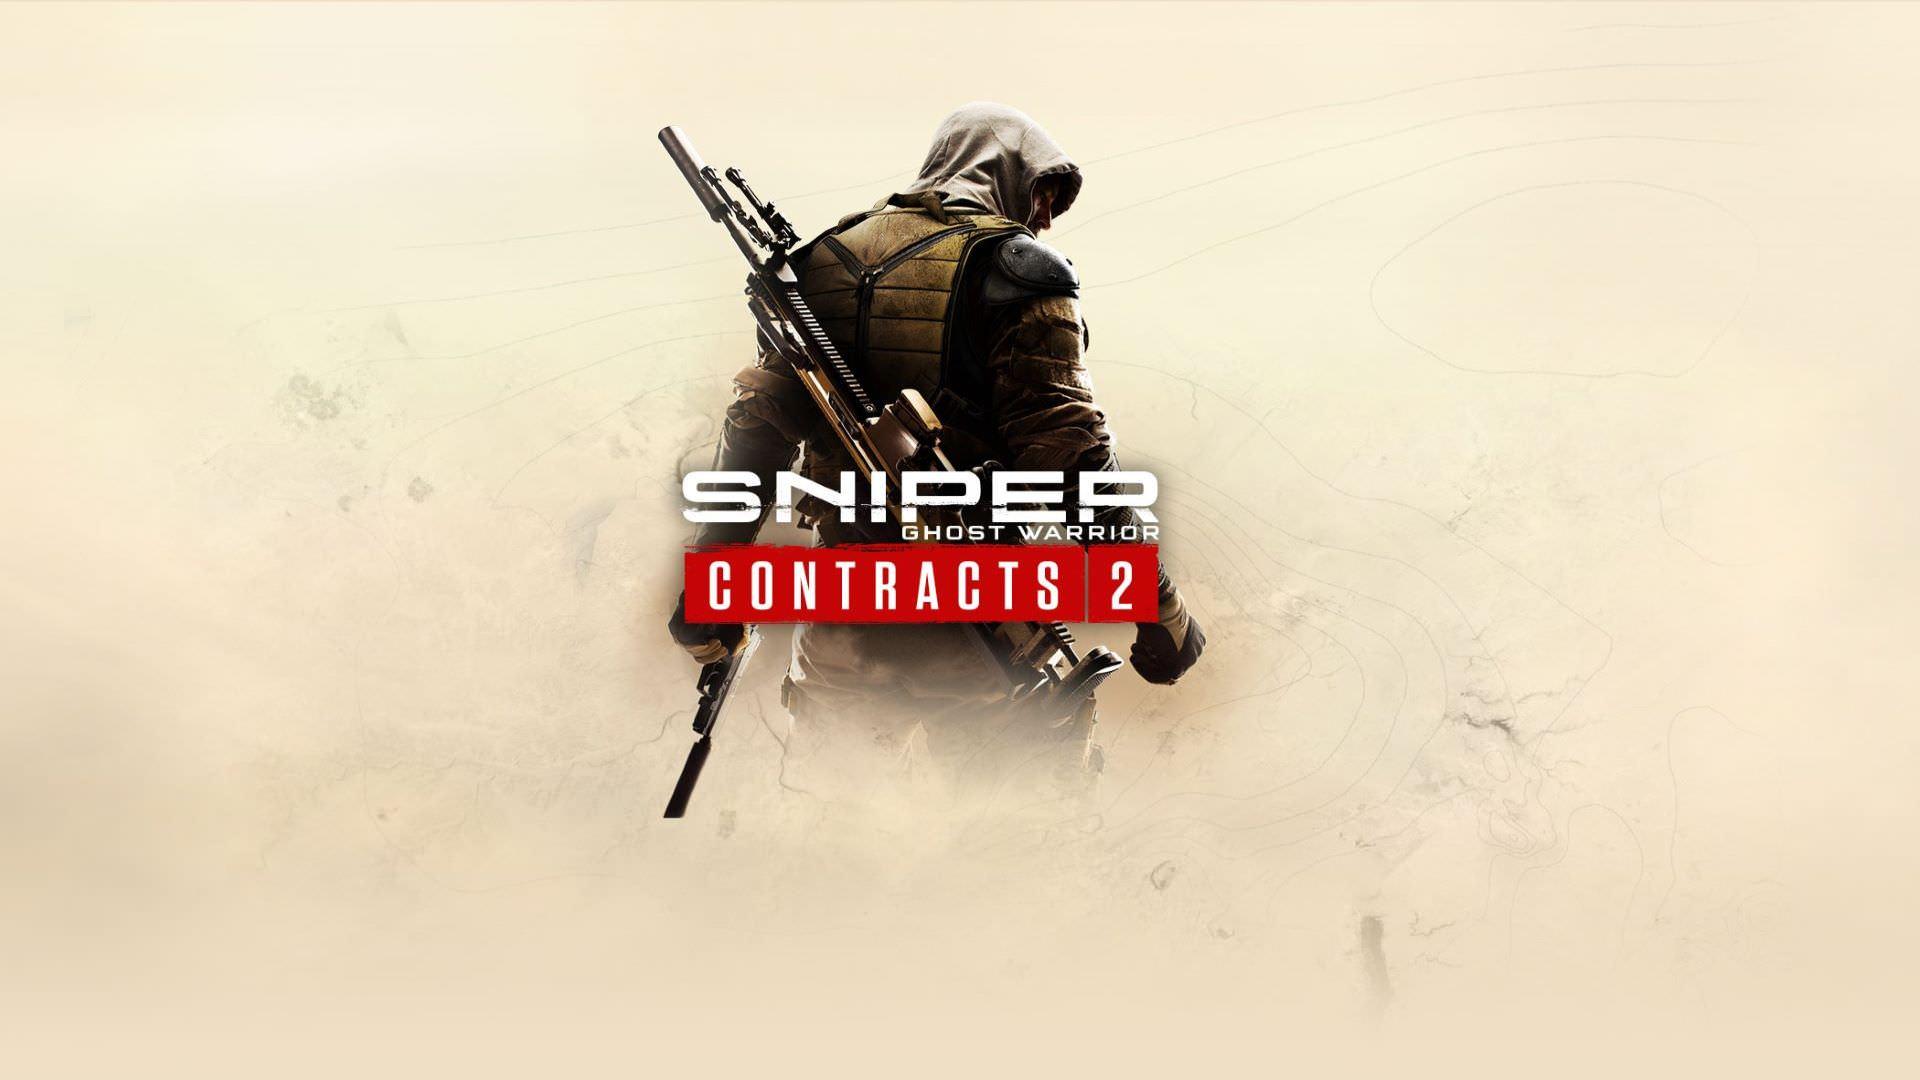 sniper ghost warrior contracts 2 poster - مصاحبه تهیهکننده Sniper Ghost Warrior Contracts 2 در مورد ویژگیهای بازی